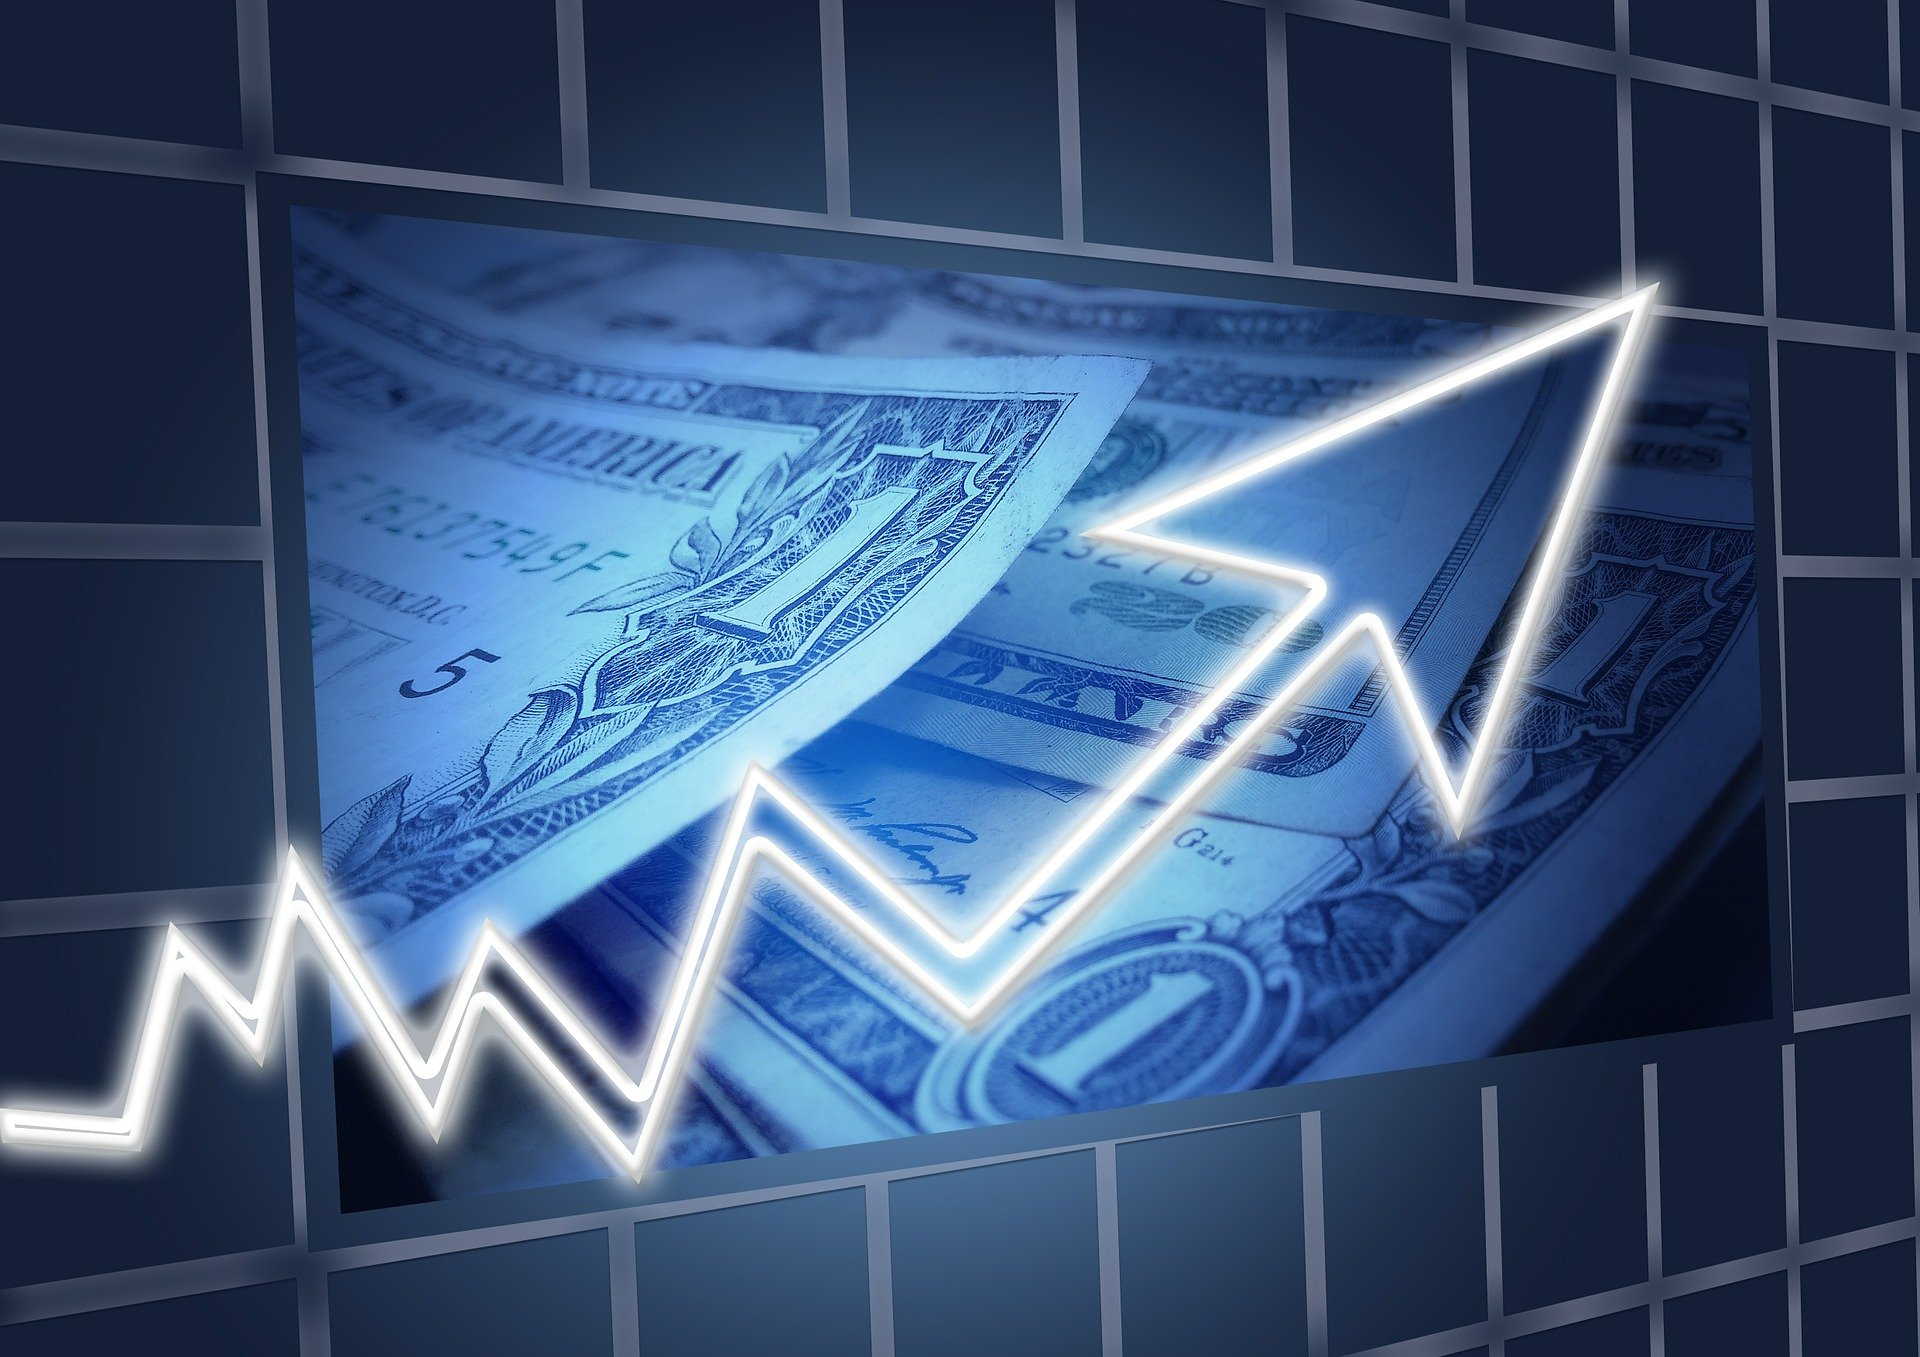 Ongekend laag aantal faillissementen, M&A-geld klotst hard tegen de plinten - Mr. online